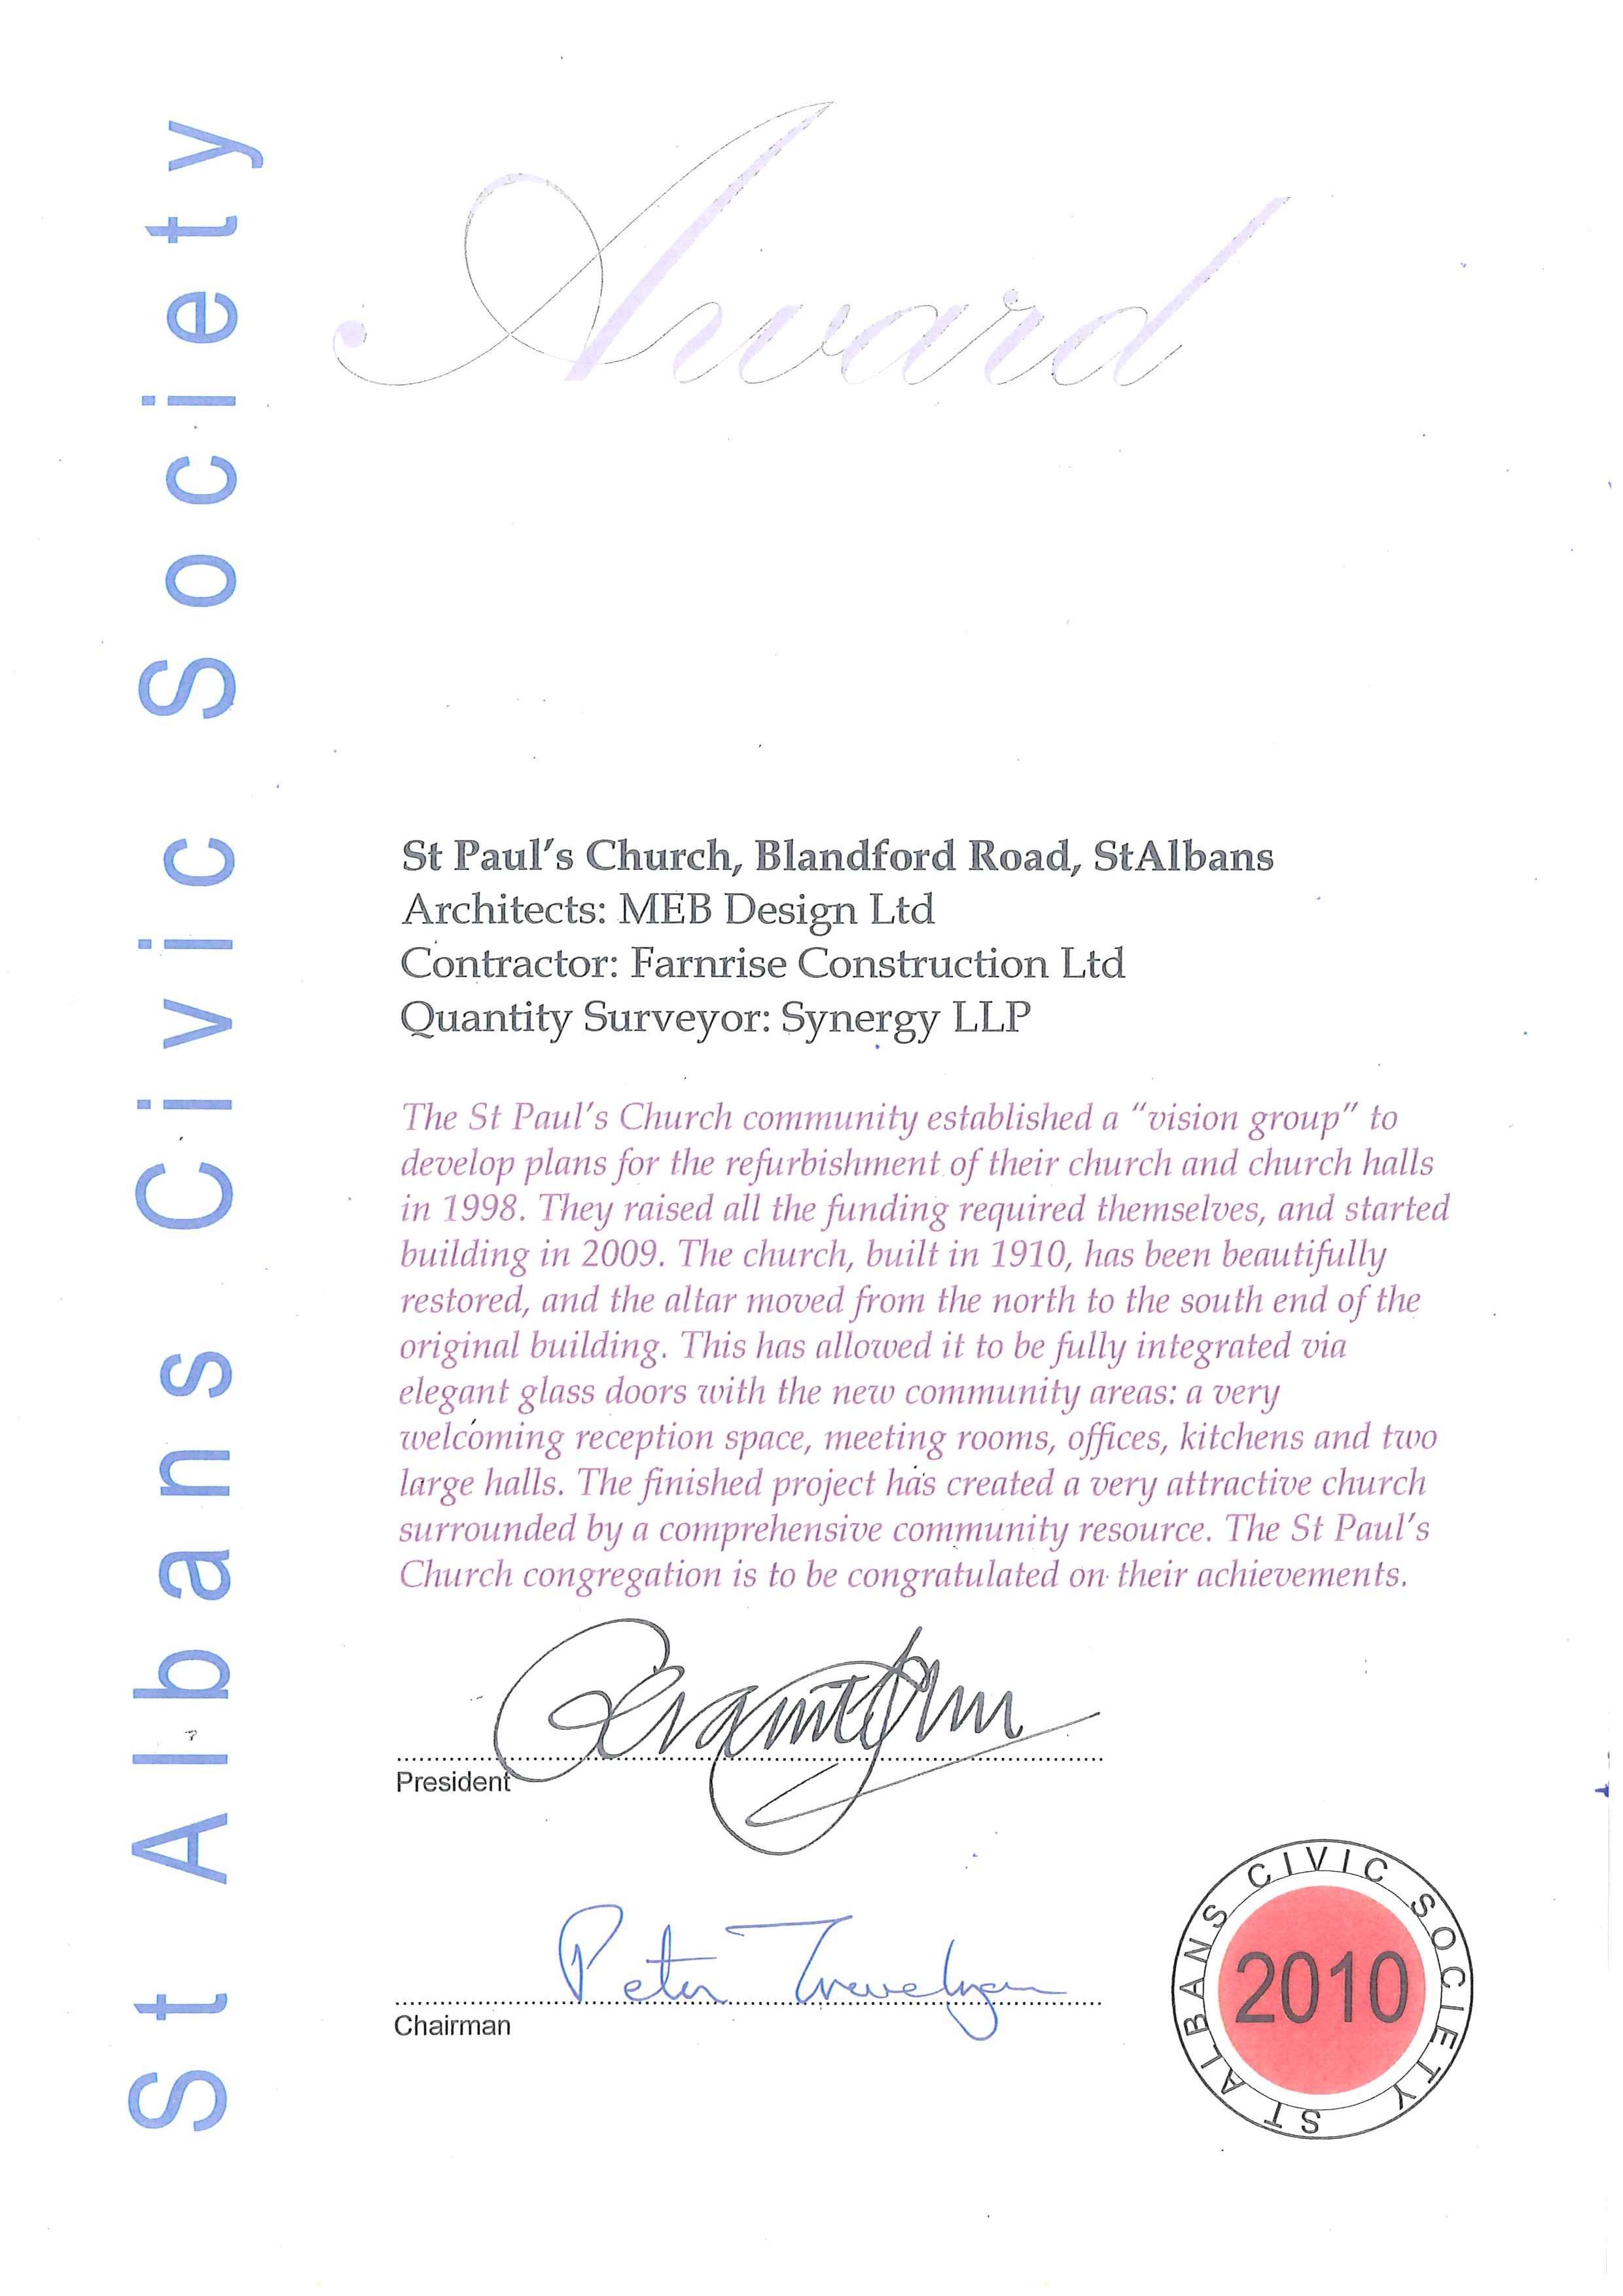 Award - St Albans 2010